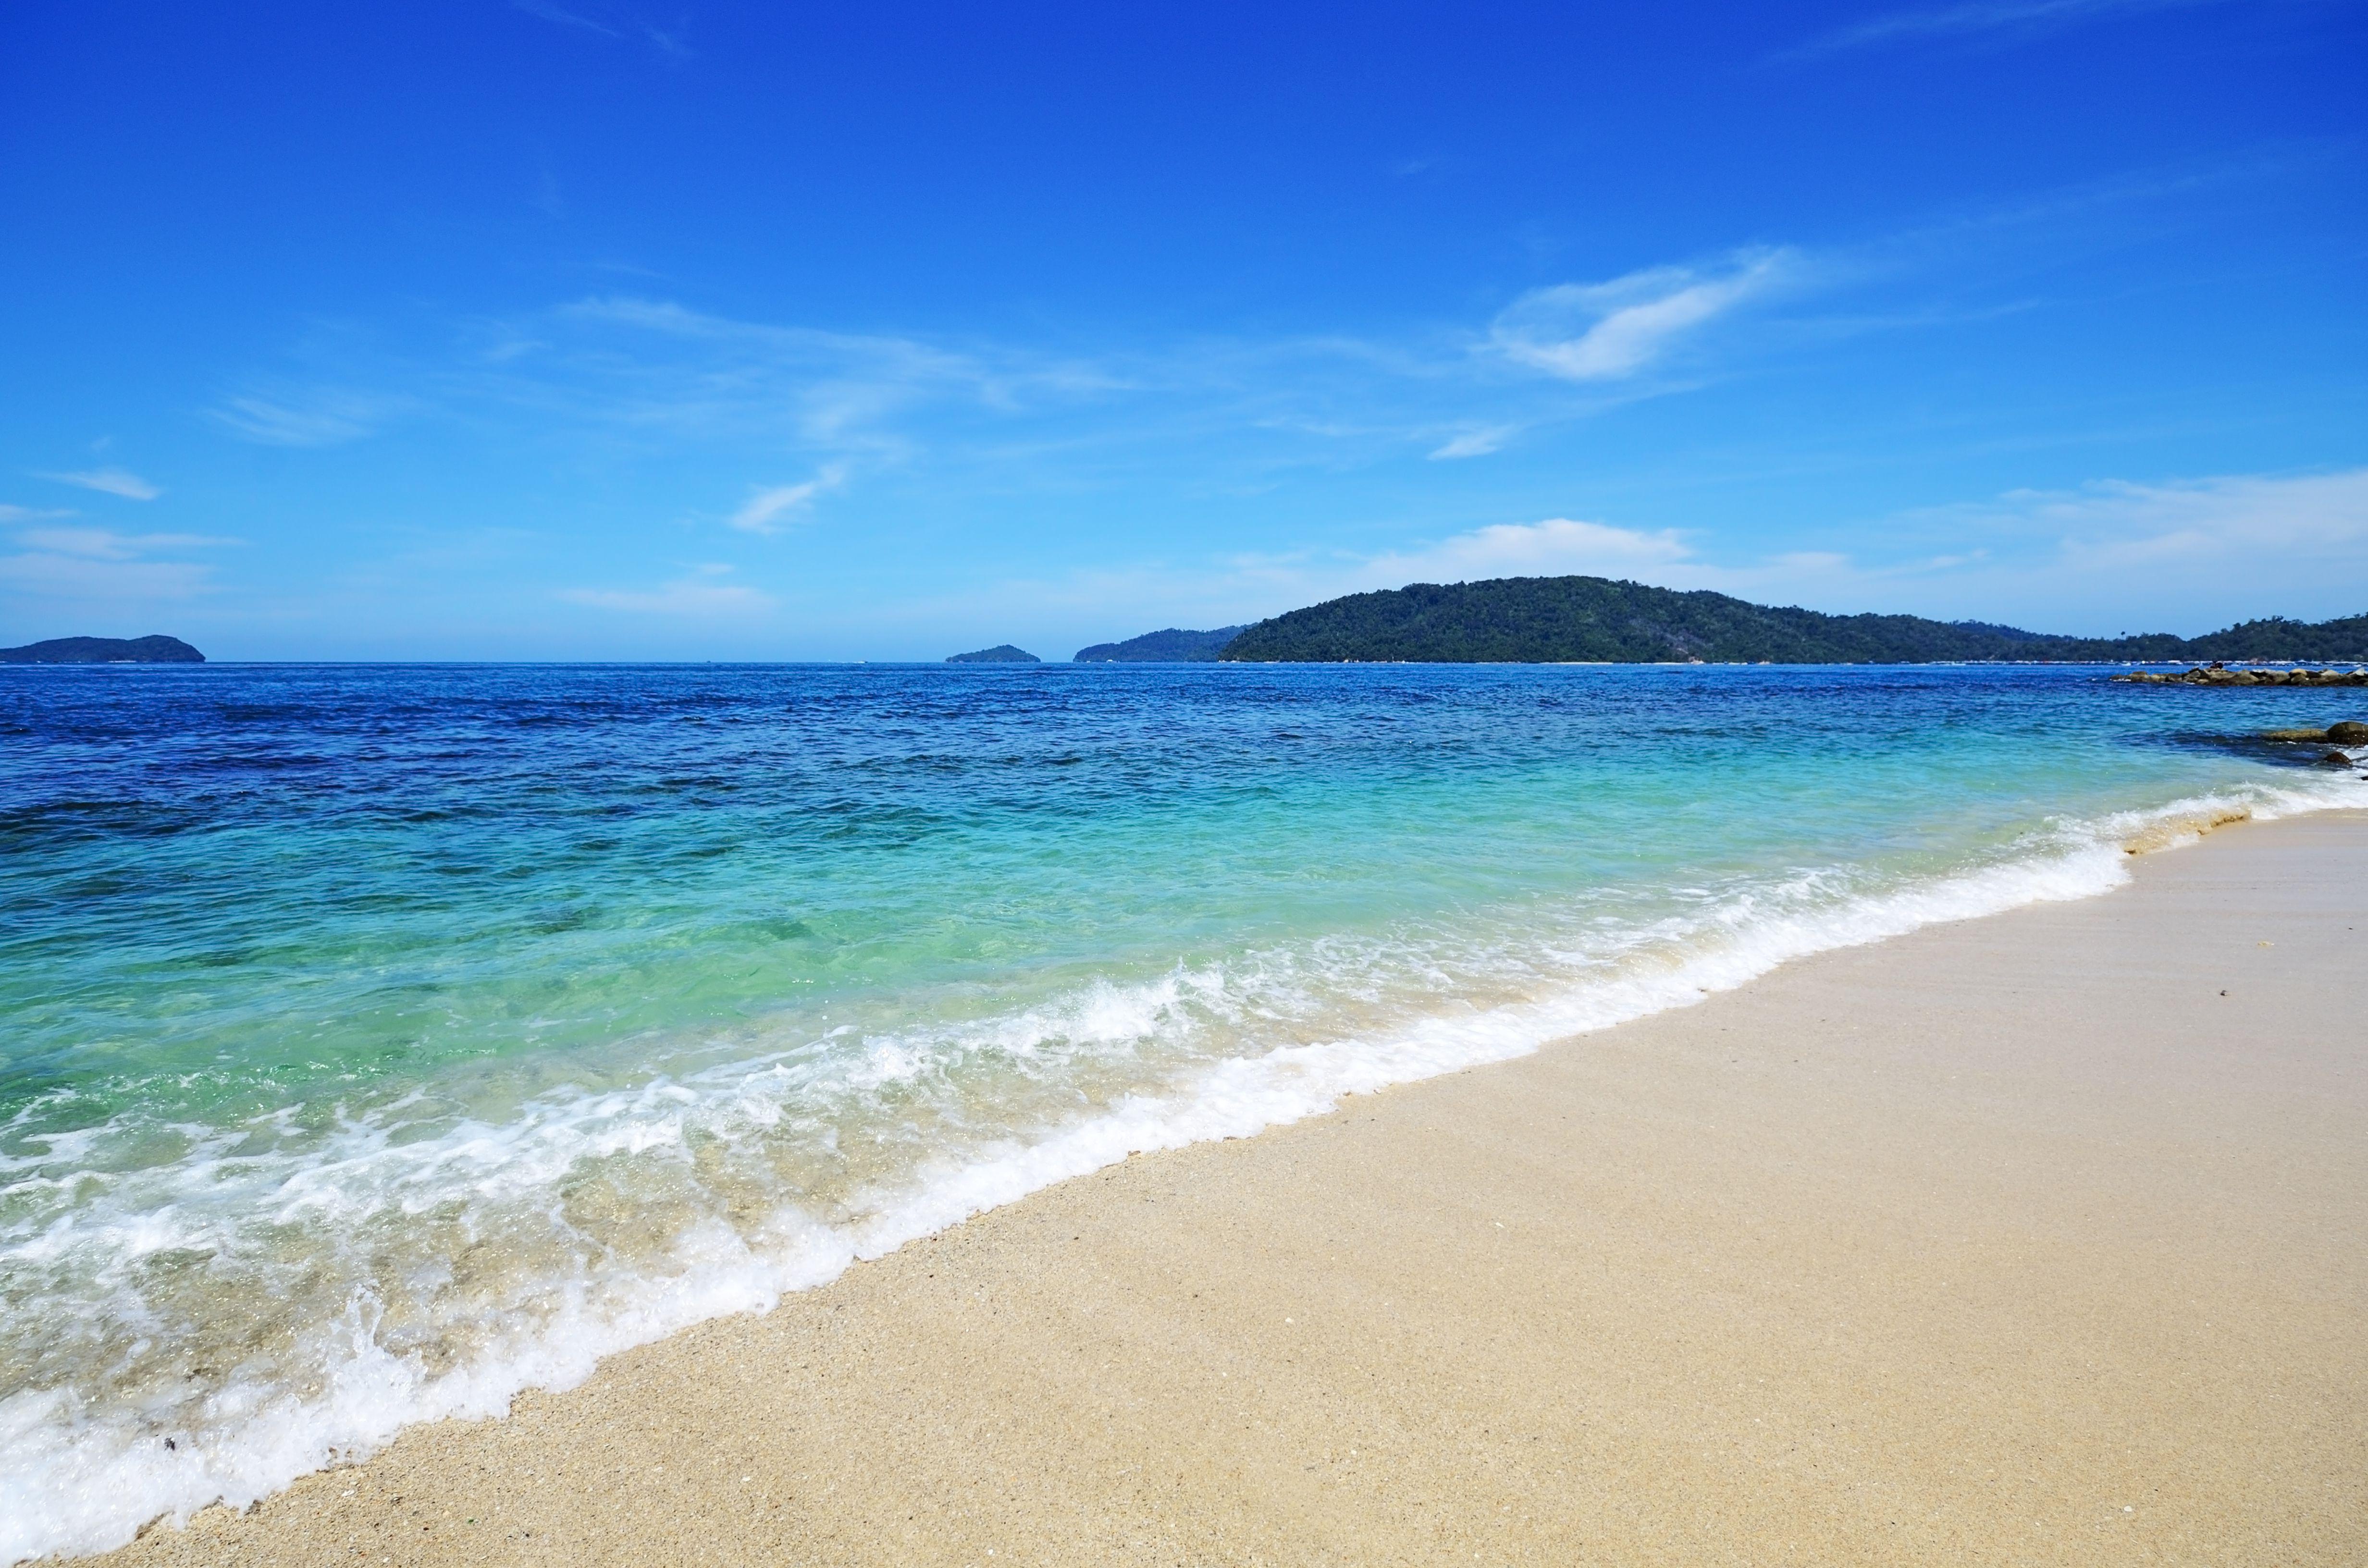 Playa en Kota Kinabalu, Sabah Borneo, Malasia